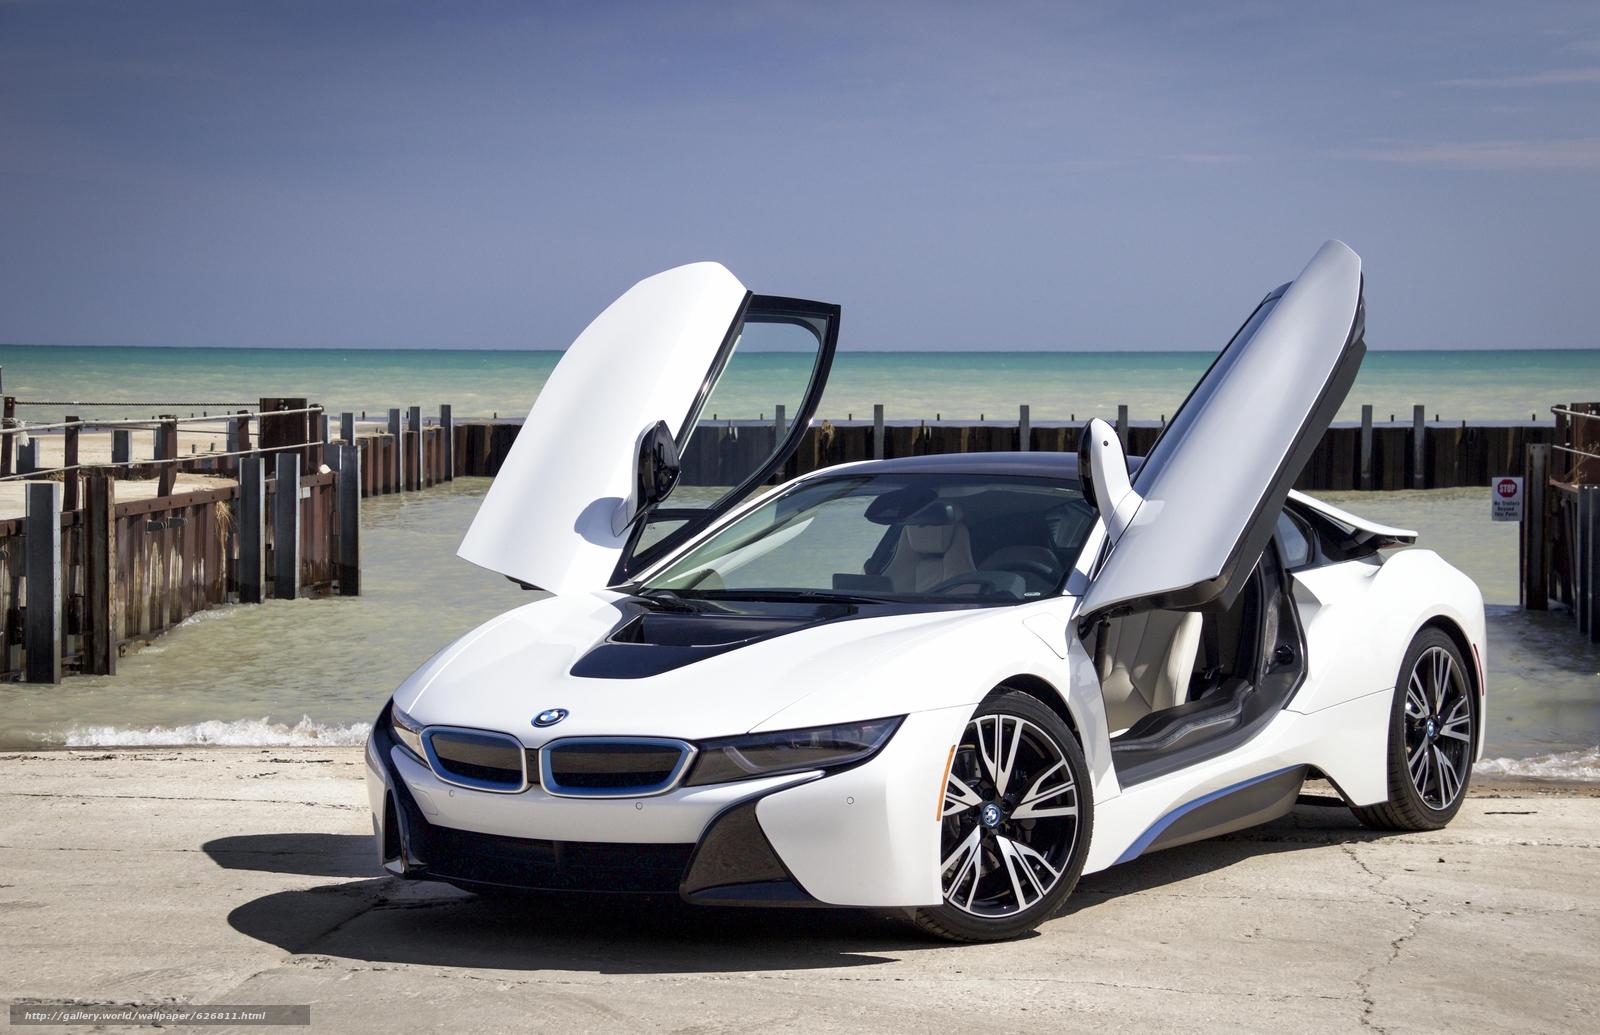 BMW i8, sports car, спорткар, купе, причал, море